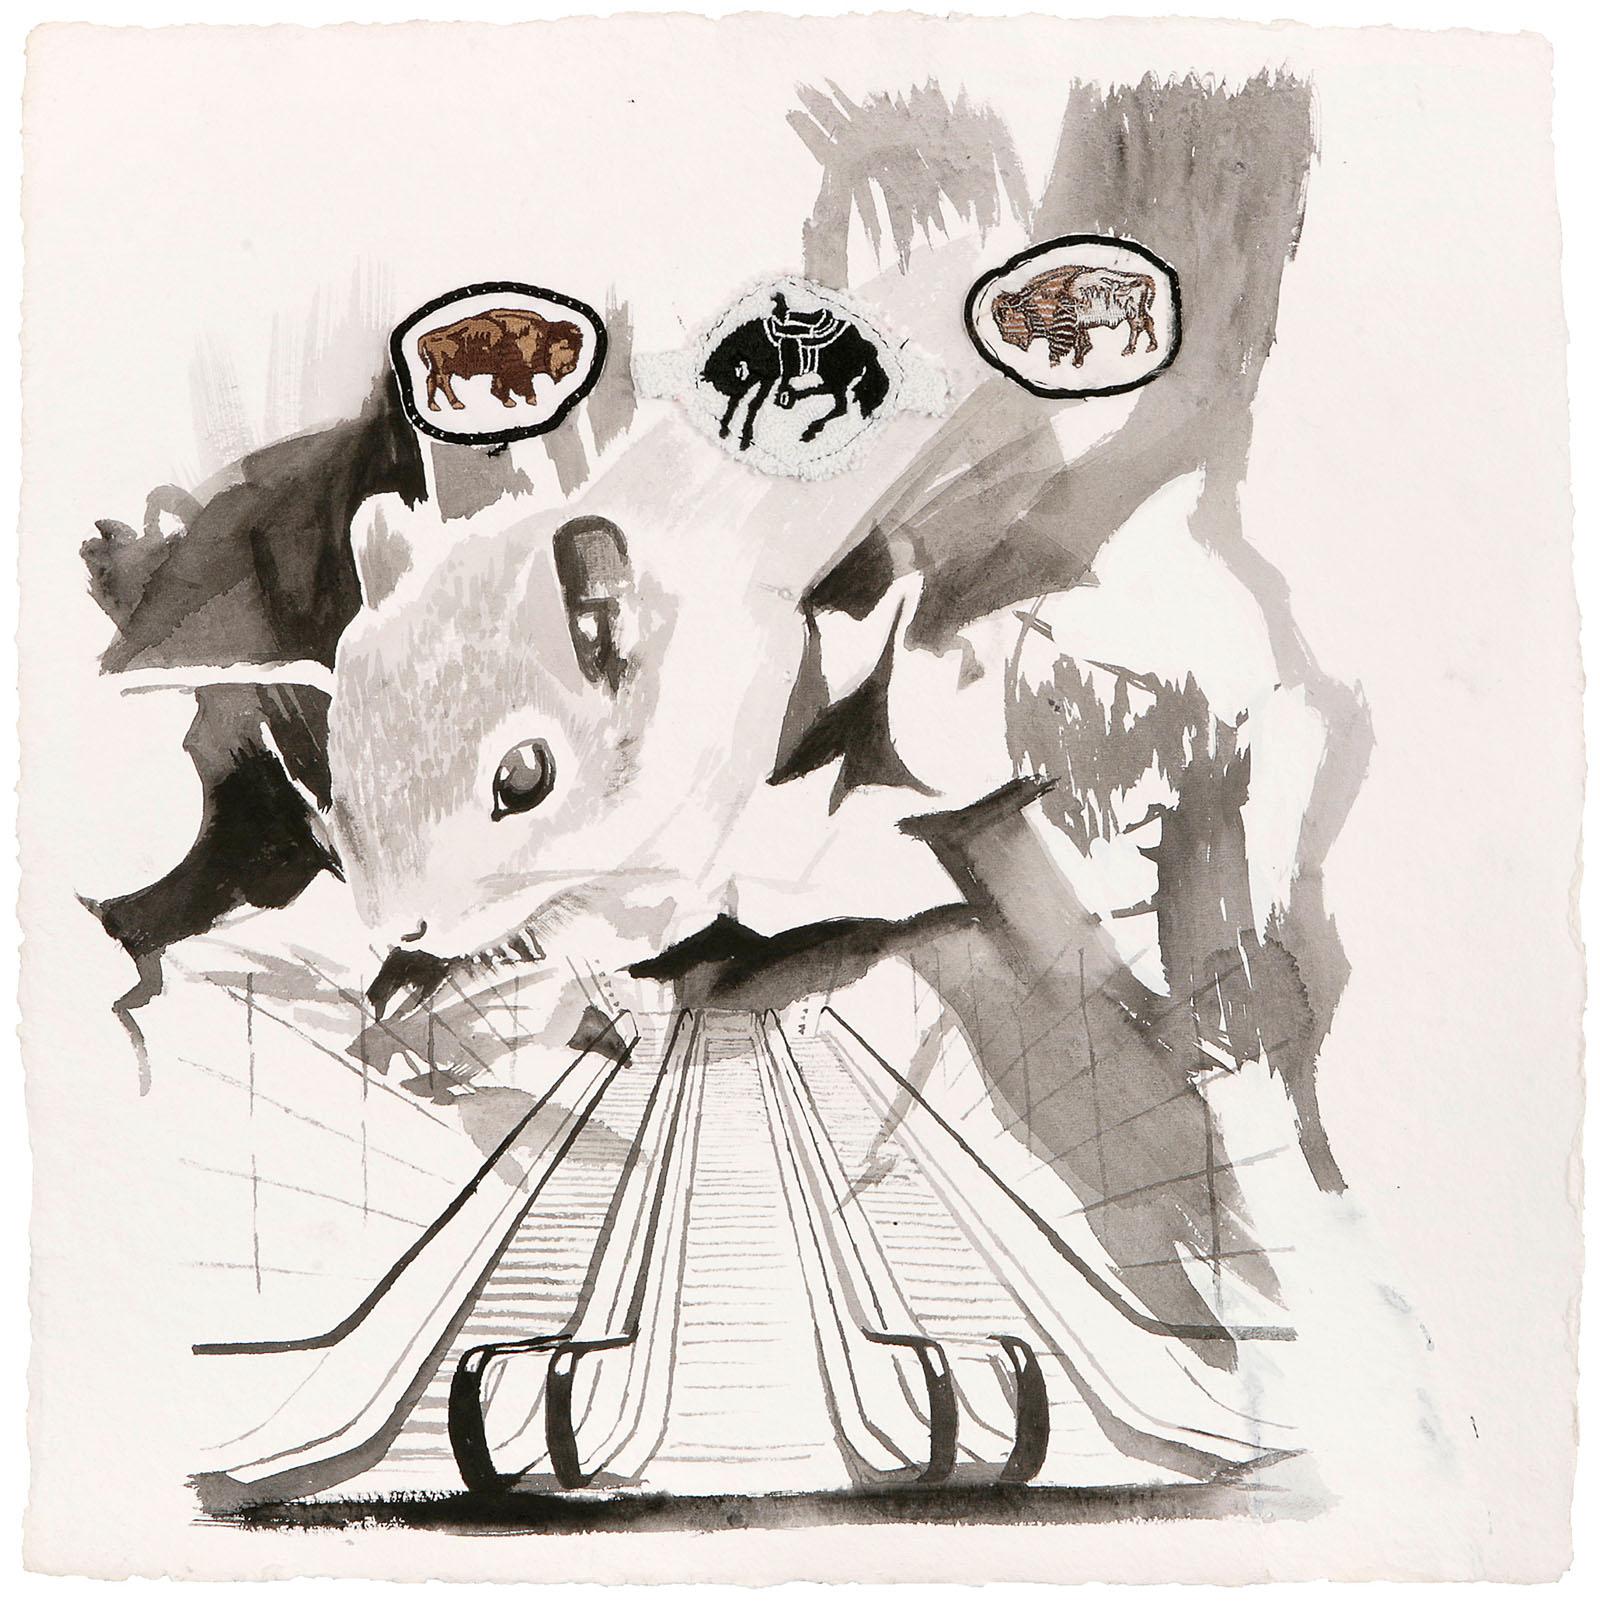 "o.T. aus ""Krähen Kommen"", 2008, 50 x 50 cm, Aquarell & Applikationen auf handgeschöpftem Bütten"